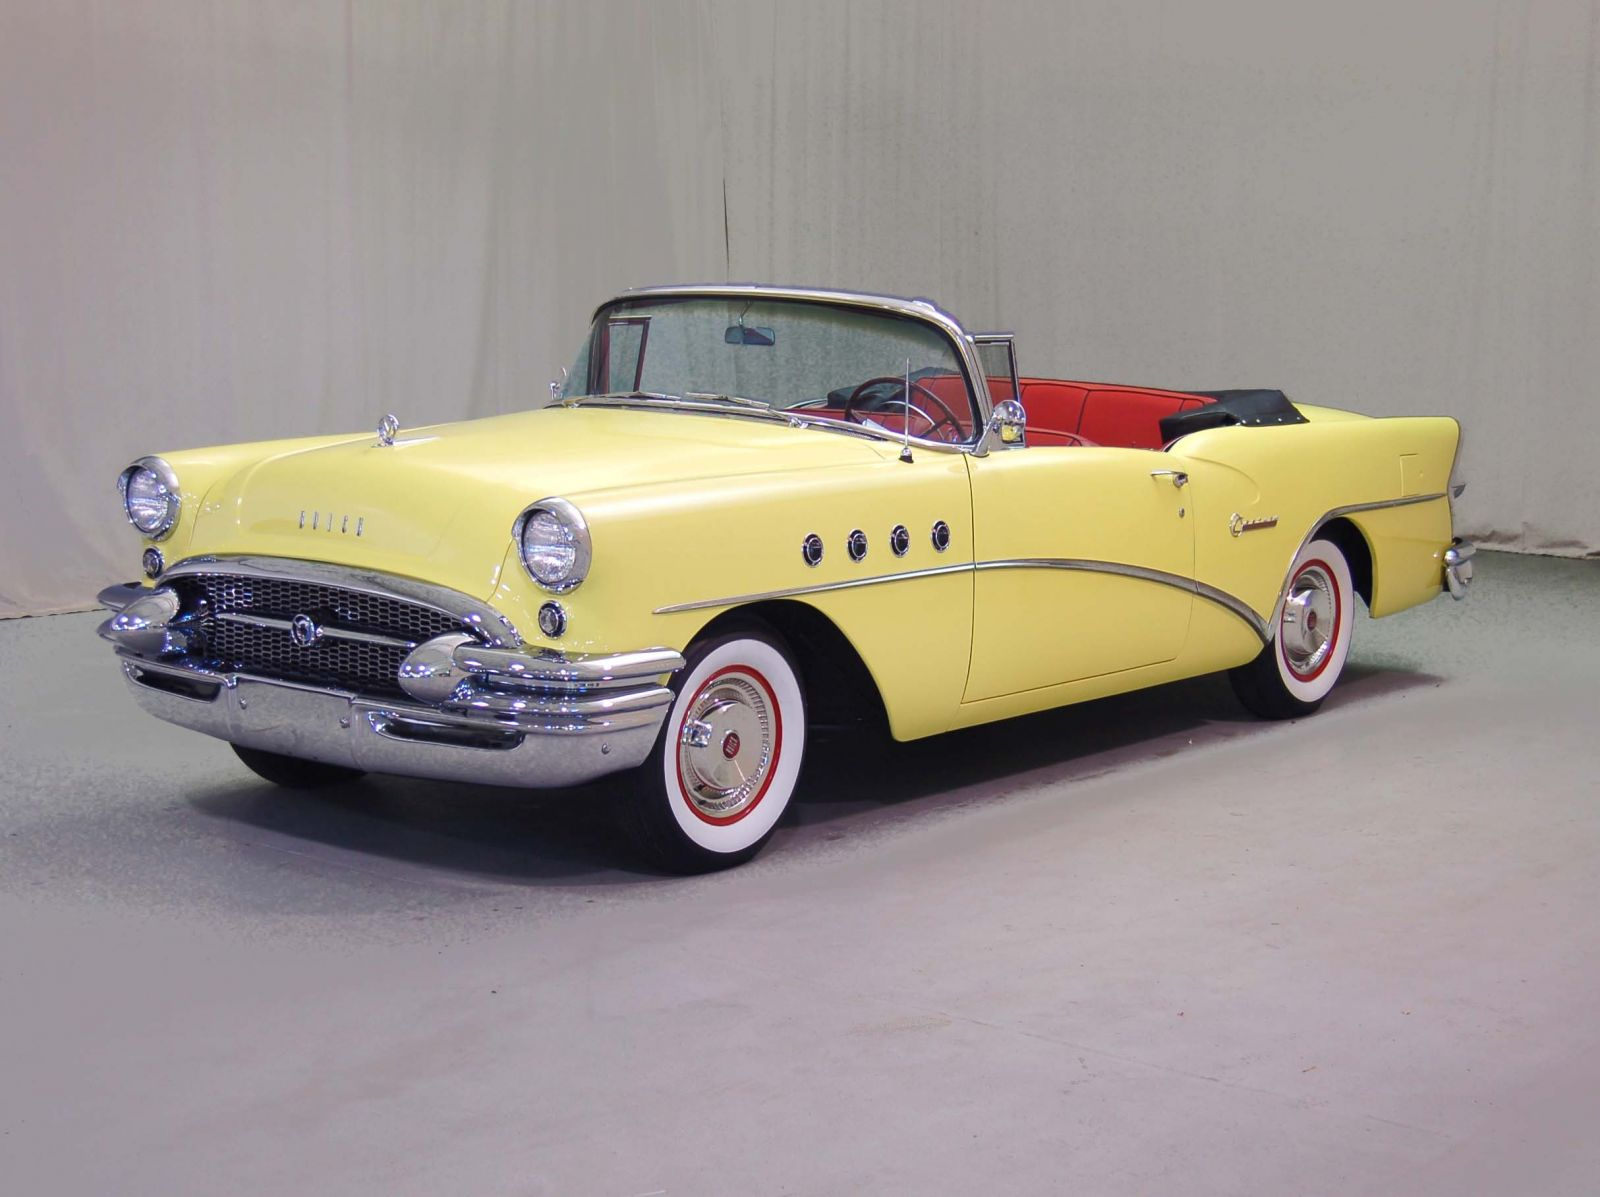 1955 Buick Century Classic Car For Sale   Buy 1955 Buick Century at Hyman LTD